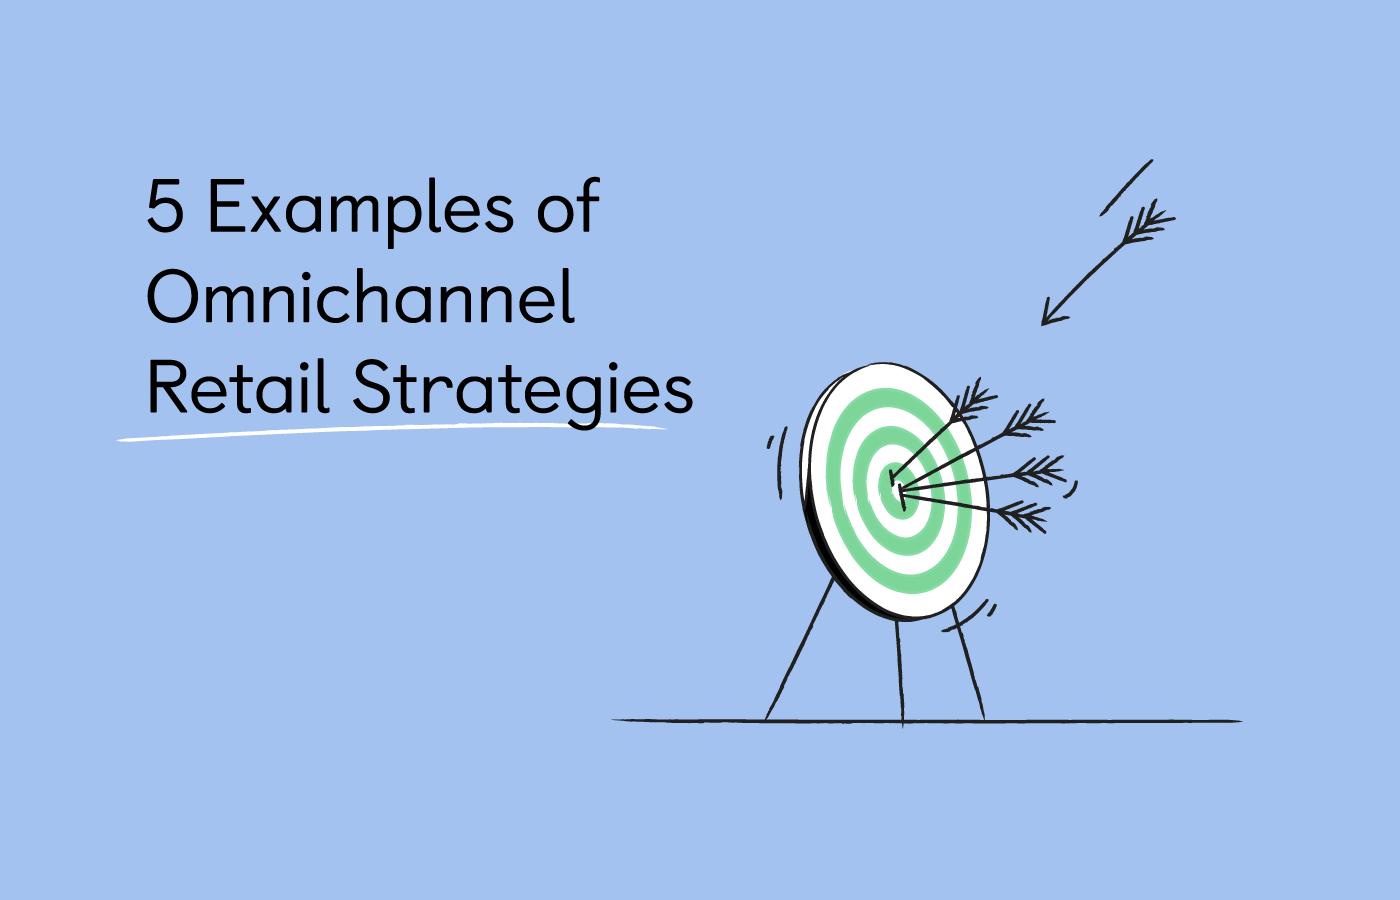 5 Examples of Omnichannel Retail Strategies